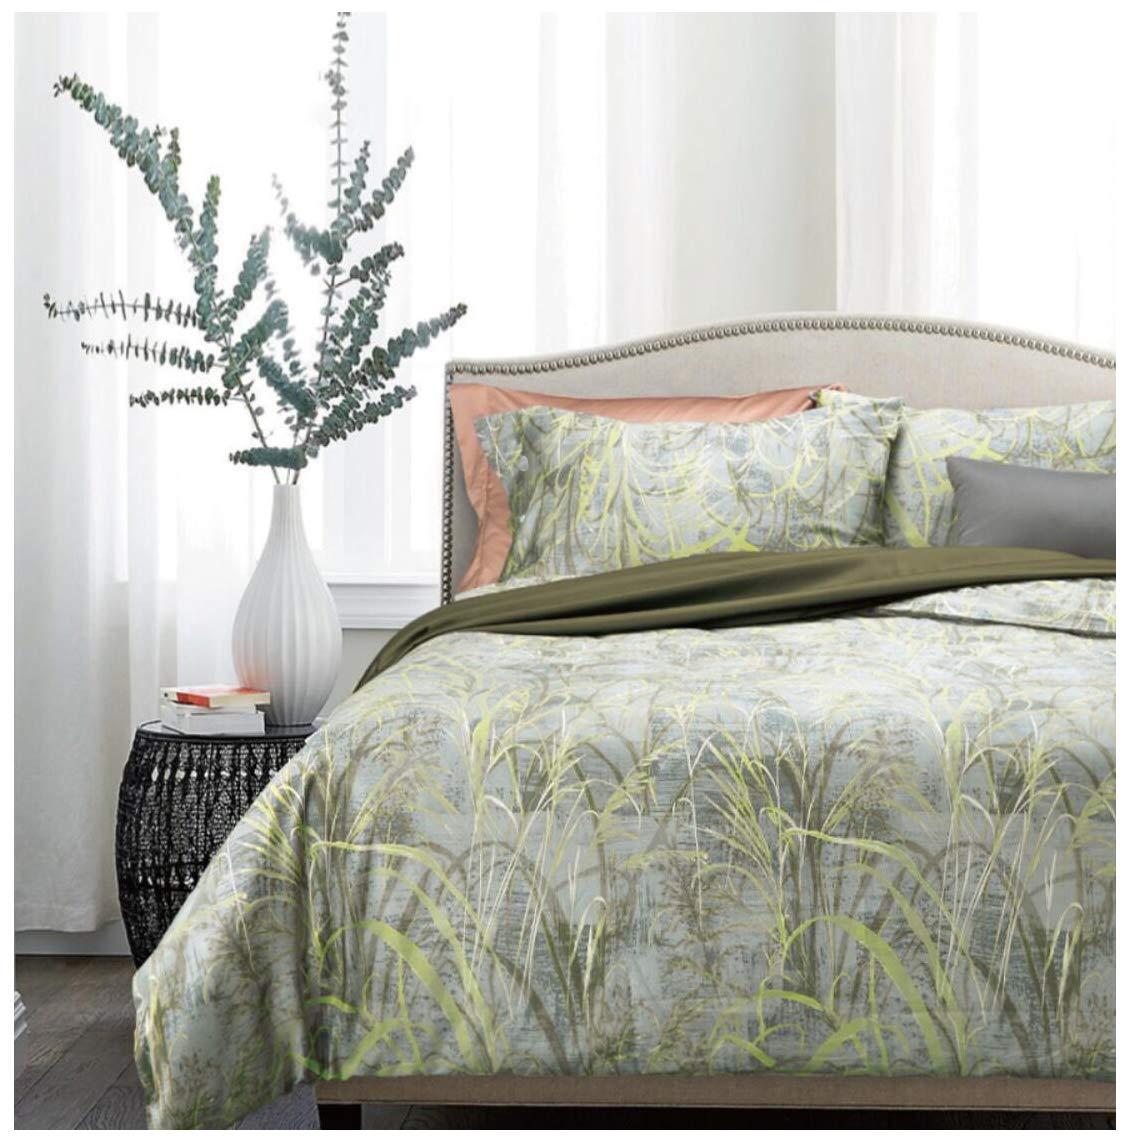 Amazon.com: Eikei Home - Juego de cama de 3 piezas con funda ...